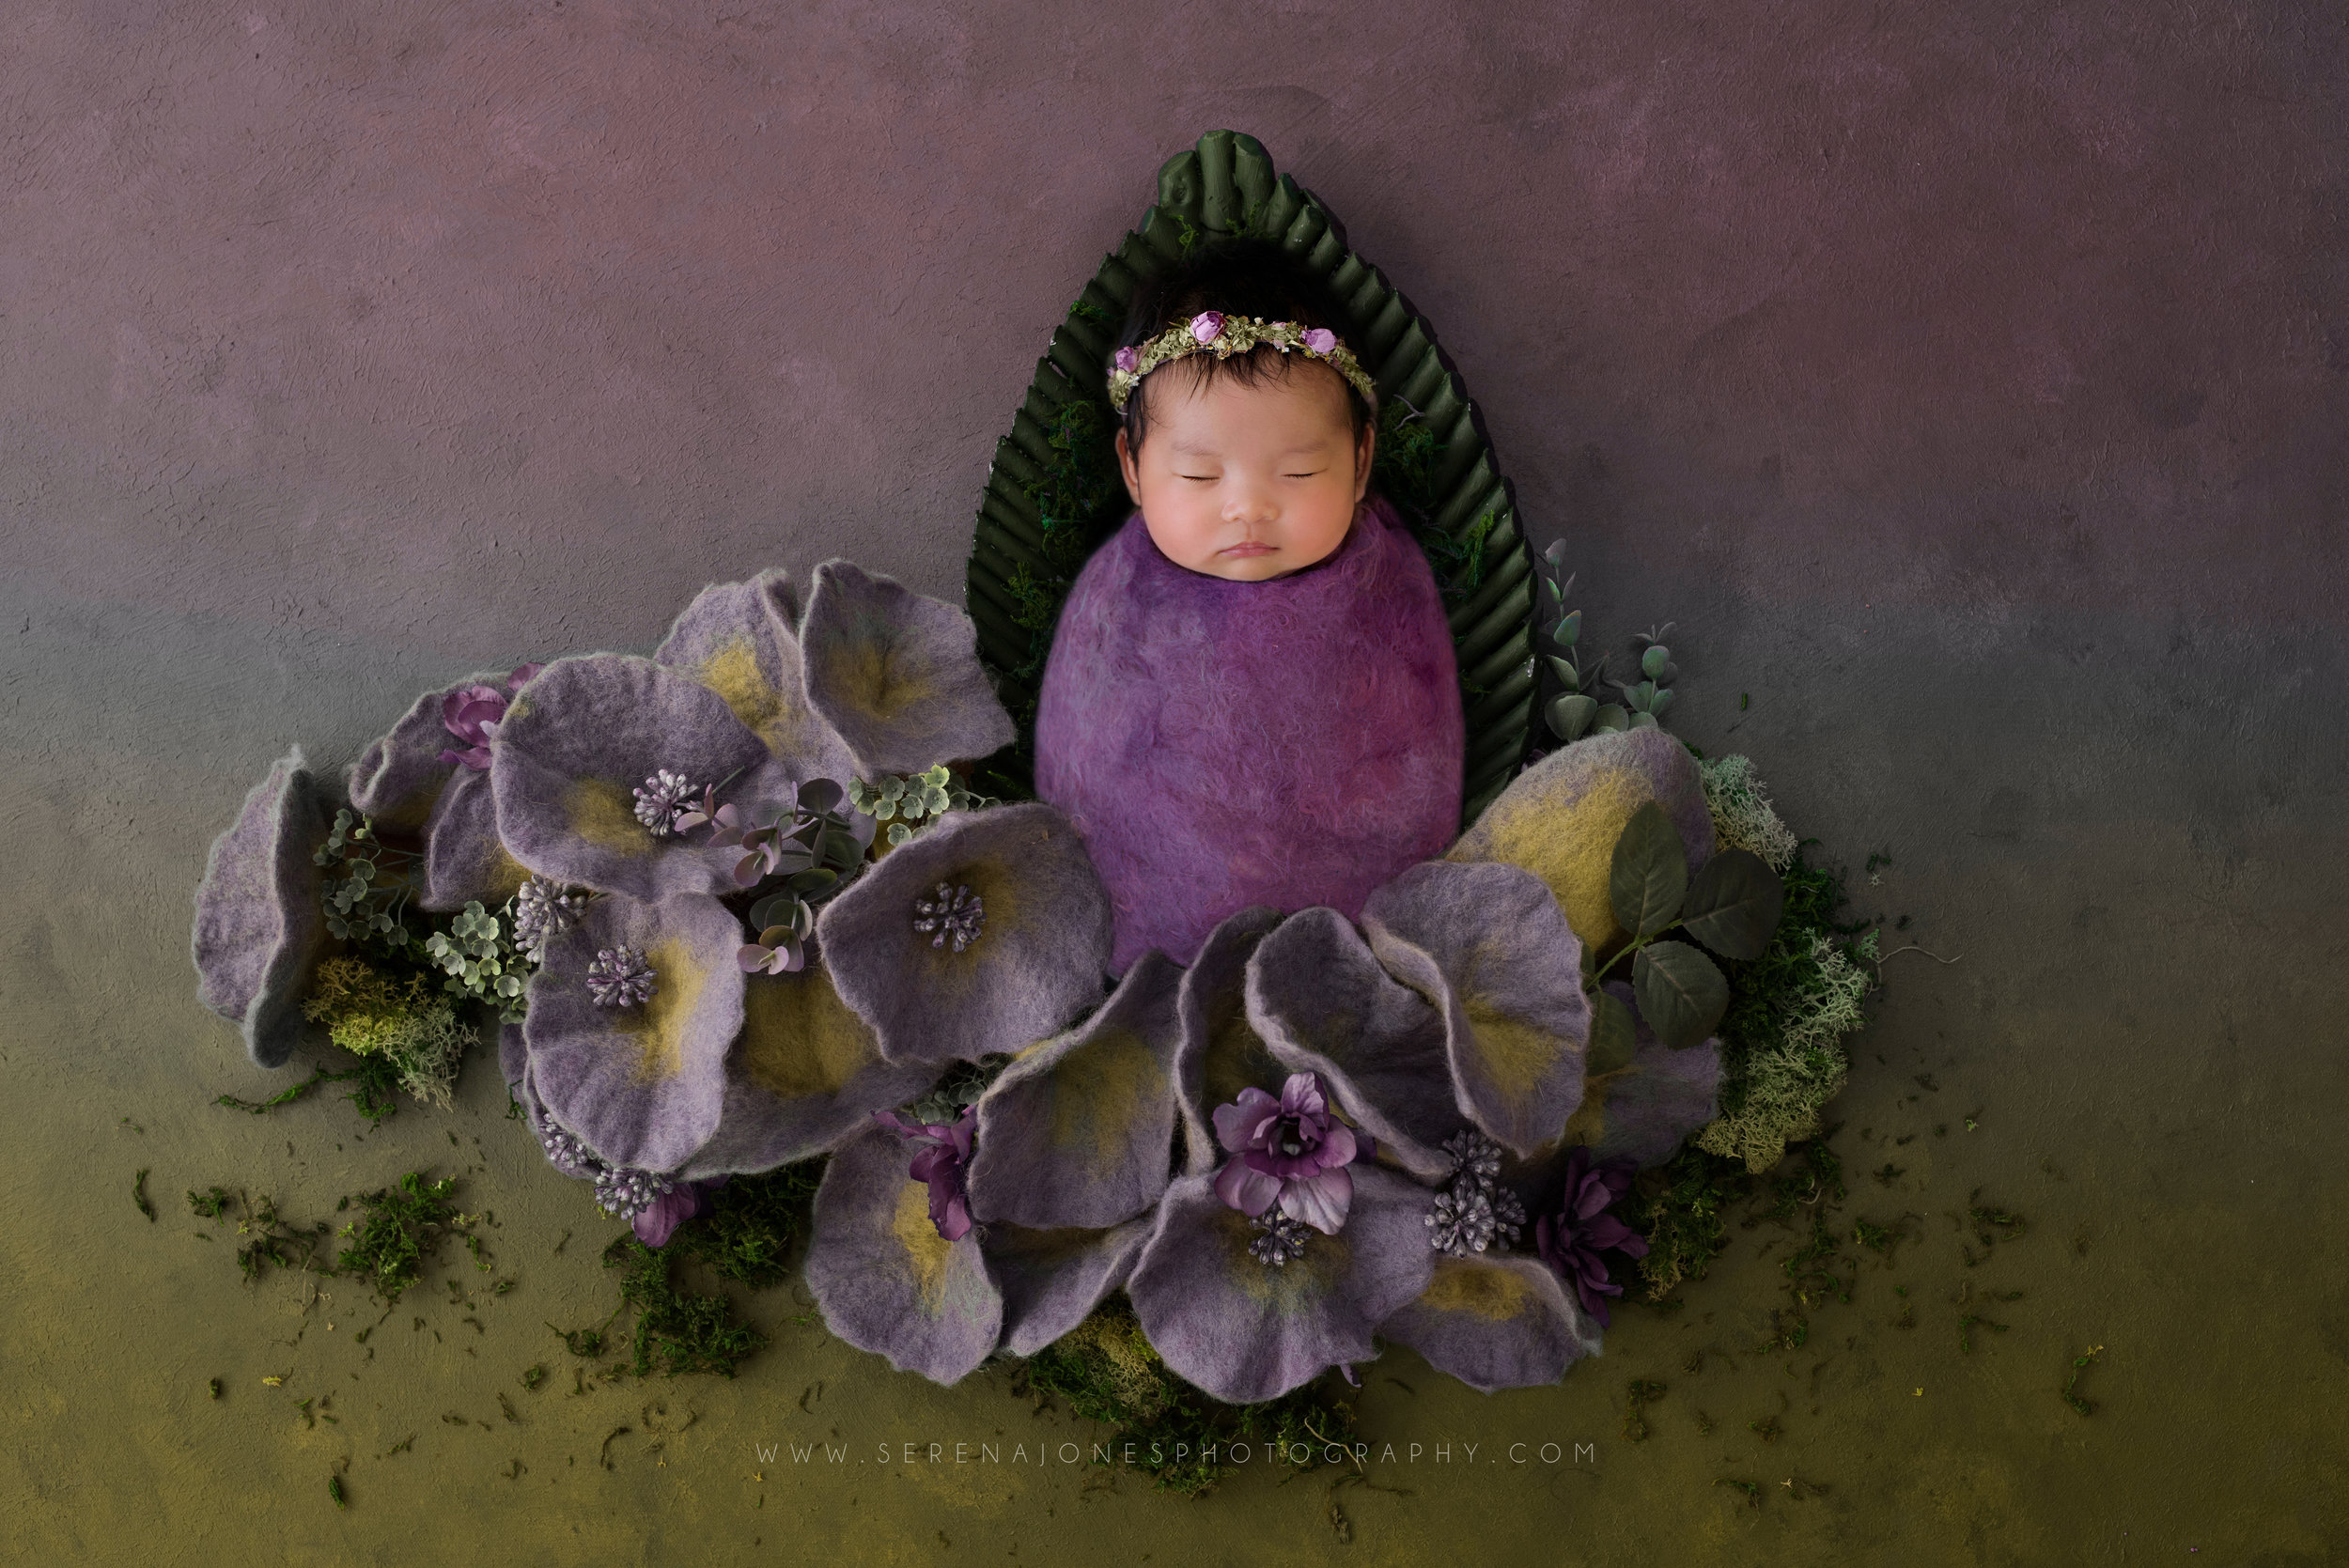 Serena Jones Photography - Tiara Joy Wu - 14.jpg